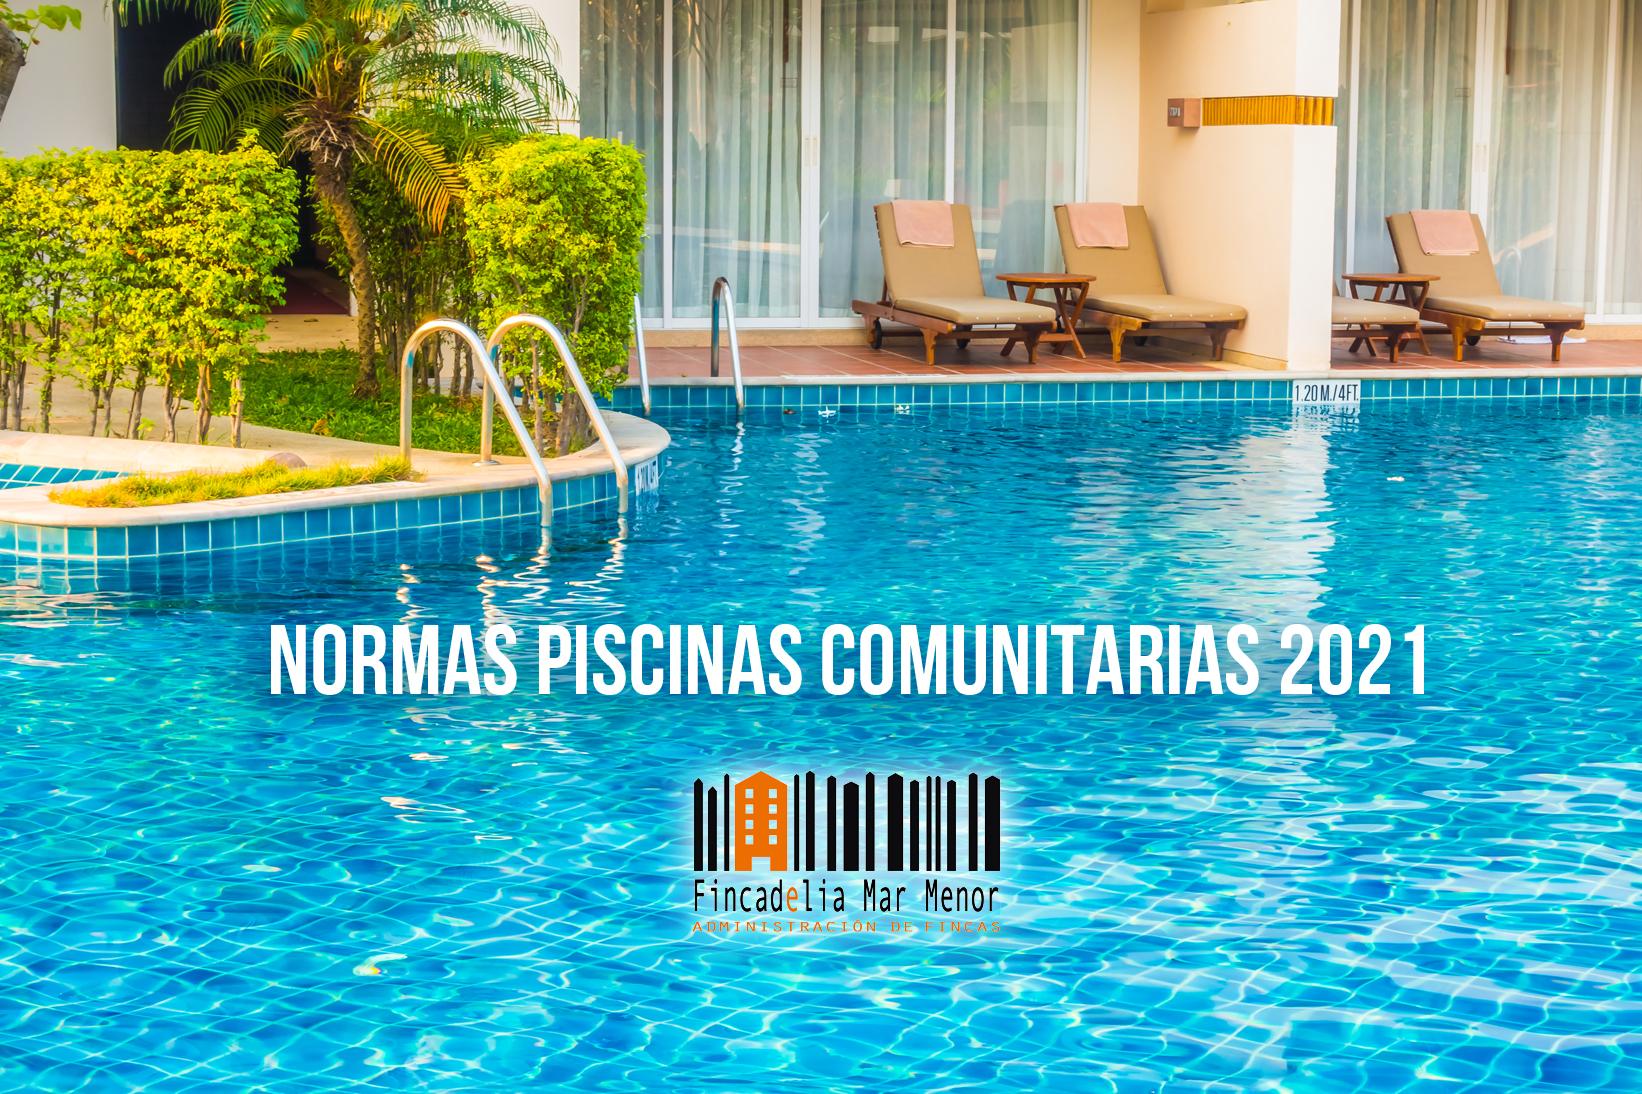 normas piscinas comunitarias 2021